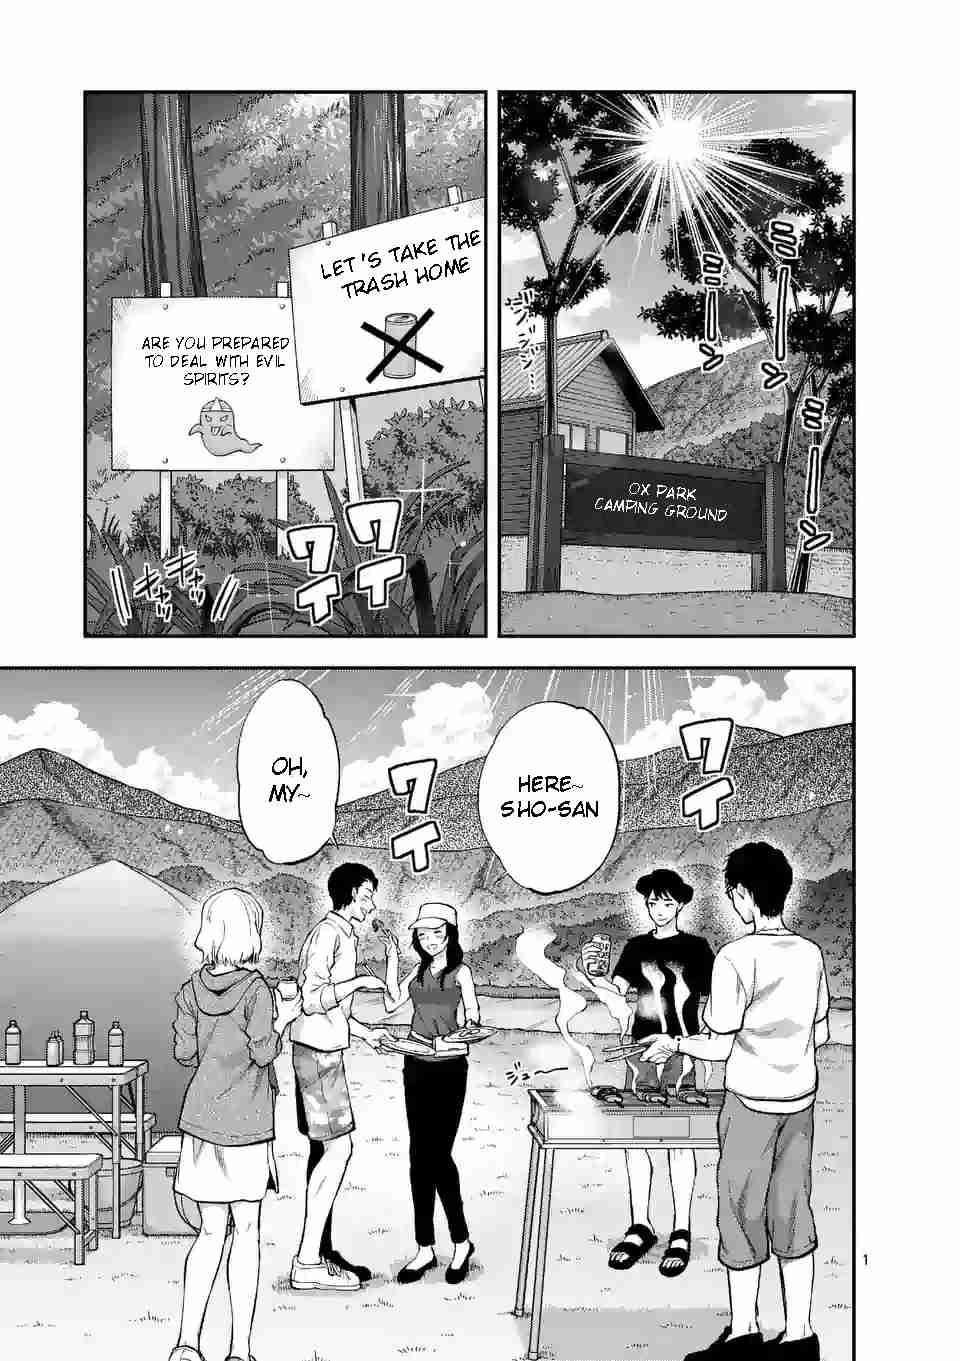 https://manga.mangadogs.com/comics/pic3/10/37194/1402920/6d93ec0ed55722ef4c3f7b0abb2ce3a5.jpg Page 1